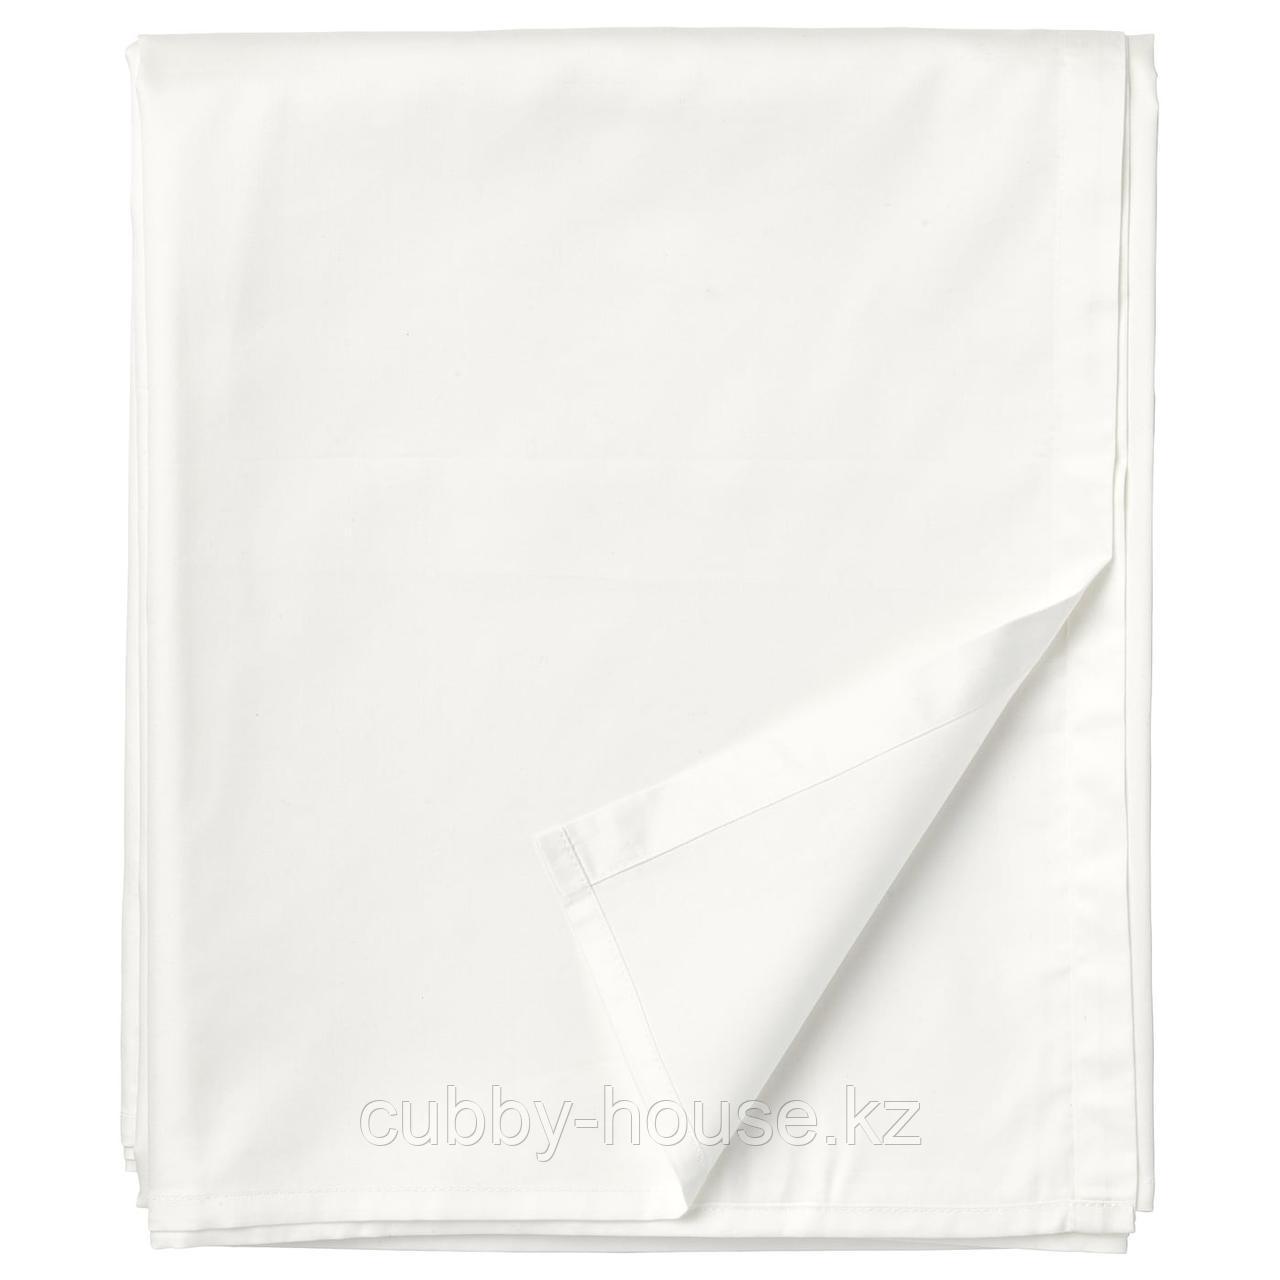 НАТТЭСМИН Простыня, белый, 240x260 см